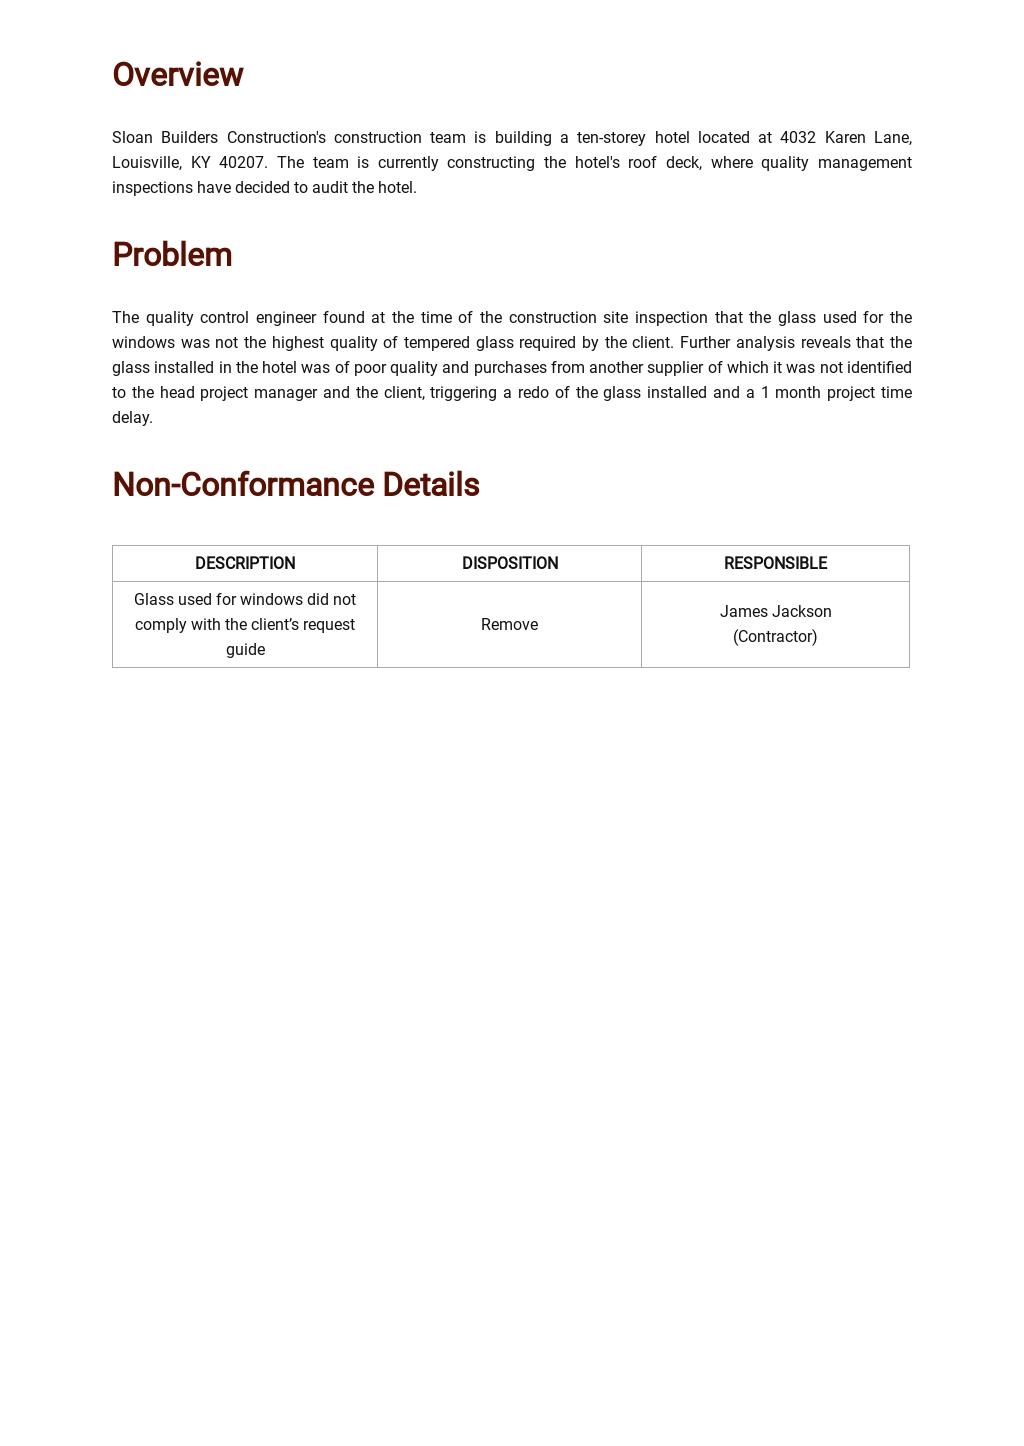 Free Product Non Conformance Report Template 1.jpe